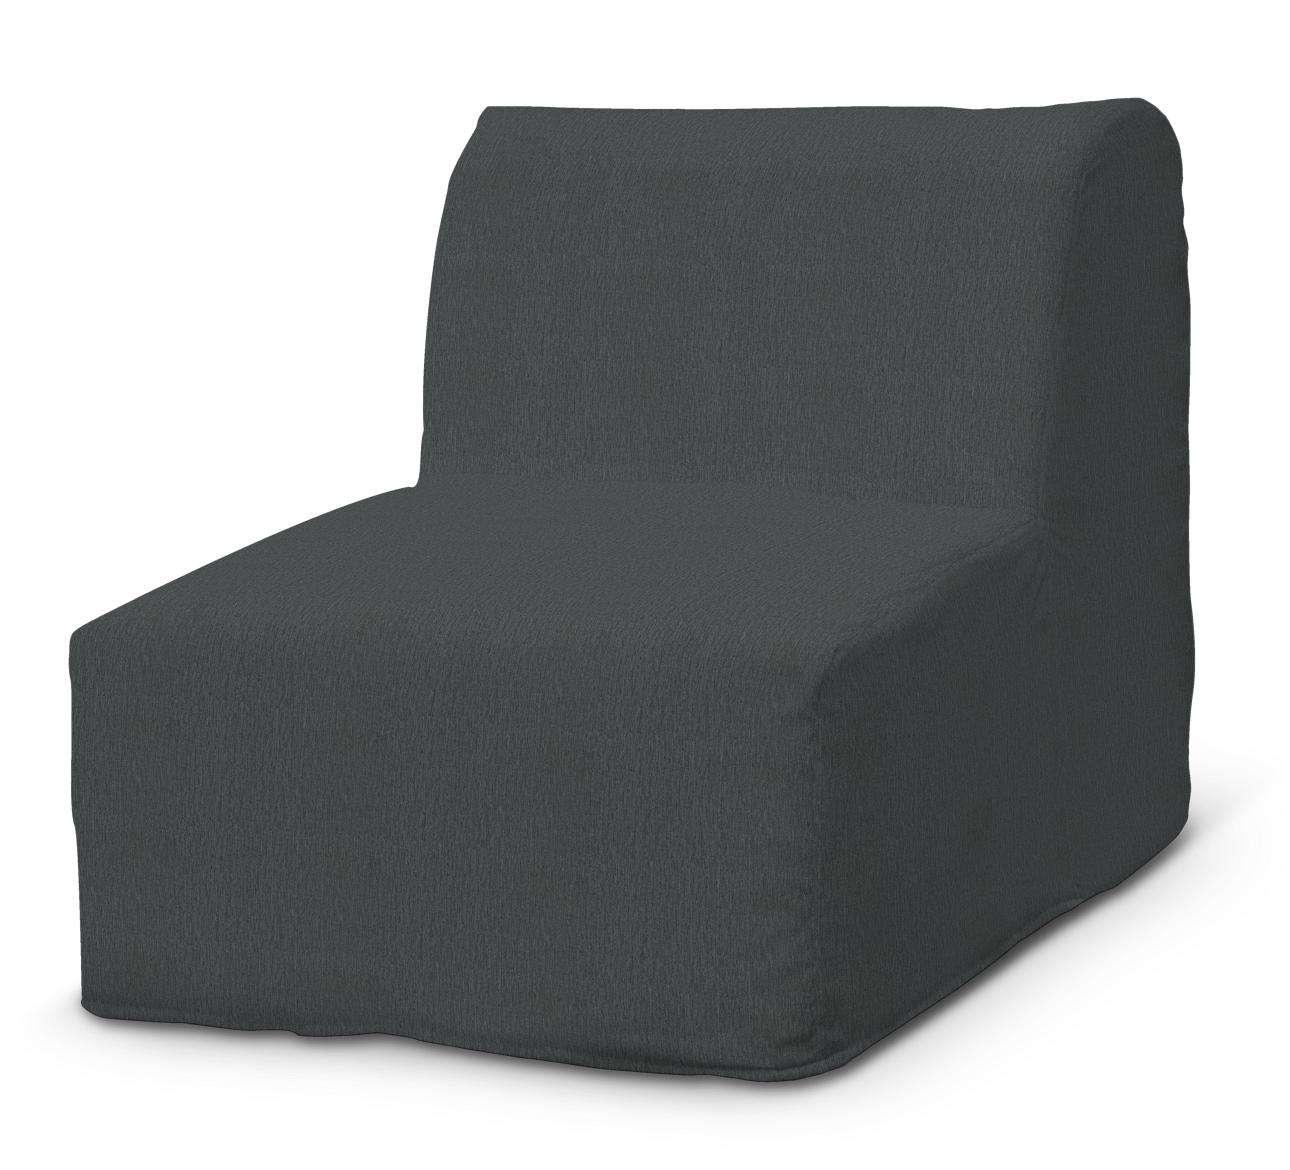 Lycksele Sesselbezug fotel Lycksele von der Kollektion Chenille , Stoff: 702-20